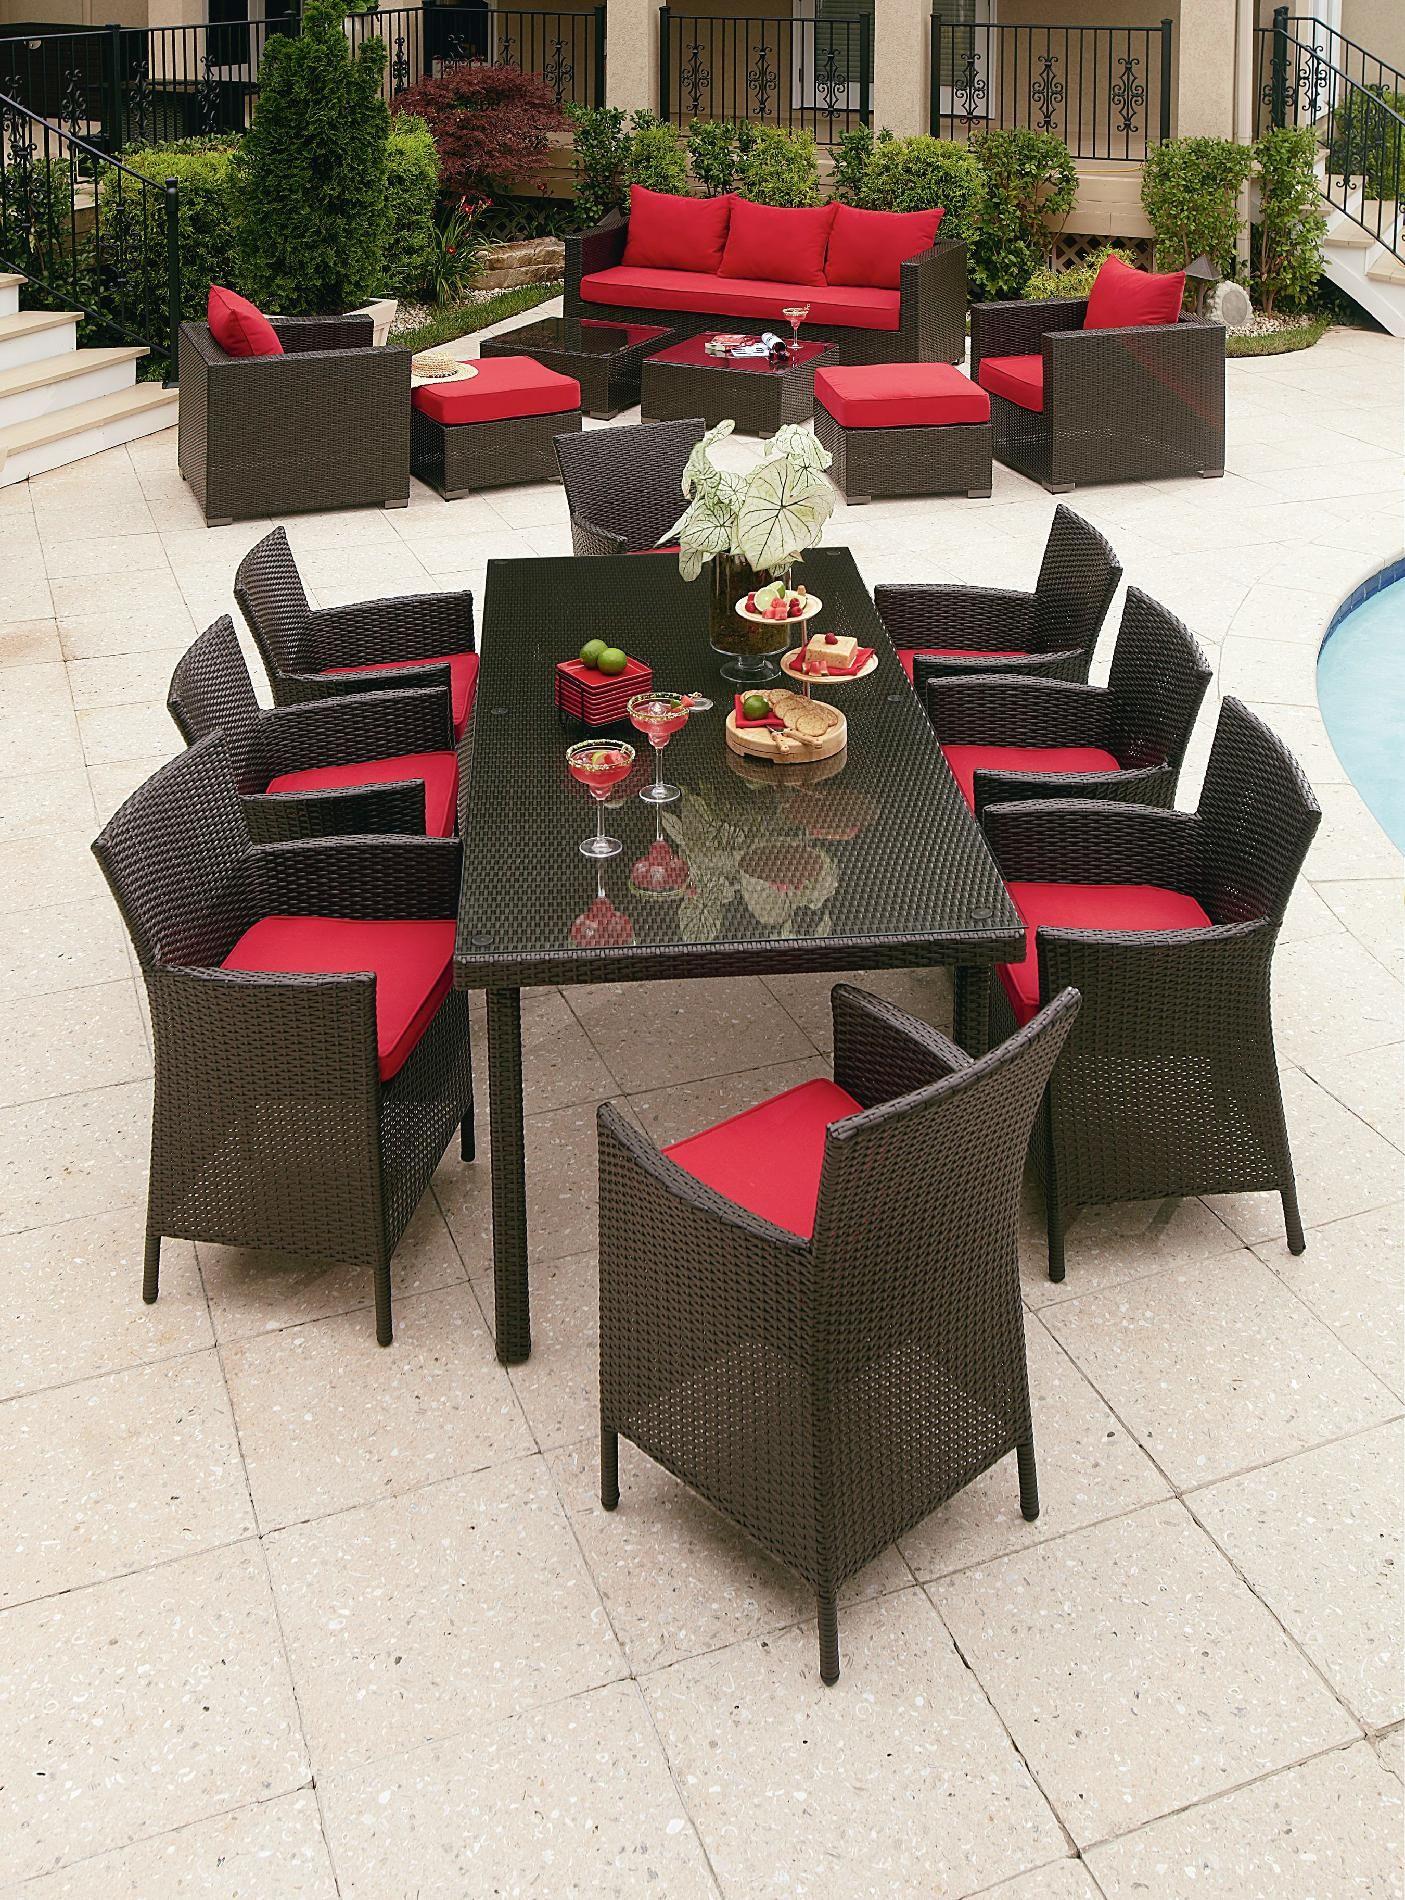 grand resort osborn 9 piece dining set outdoor furniture